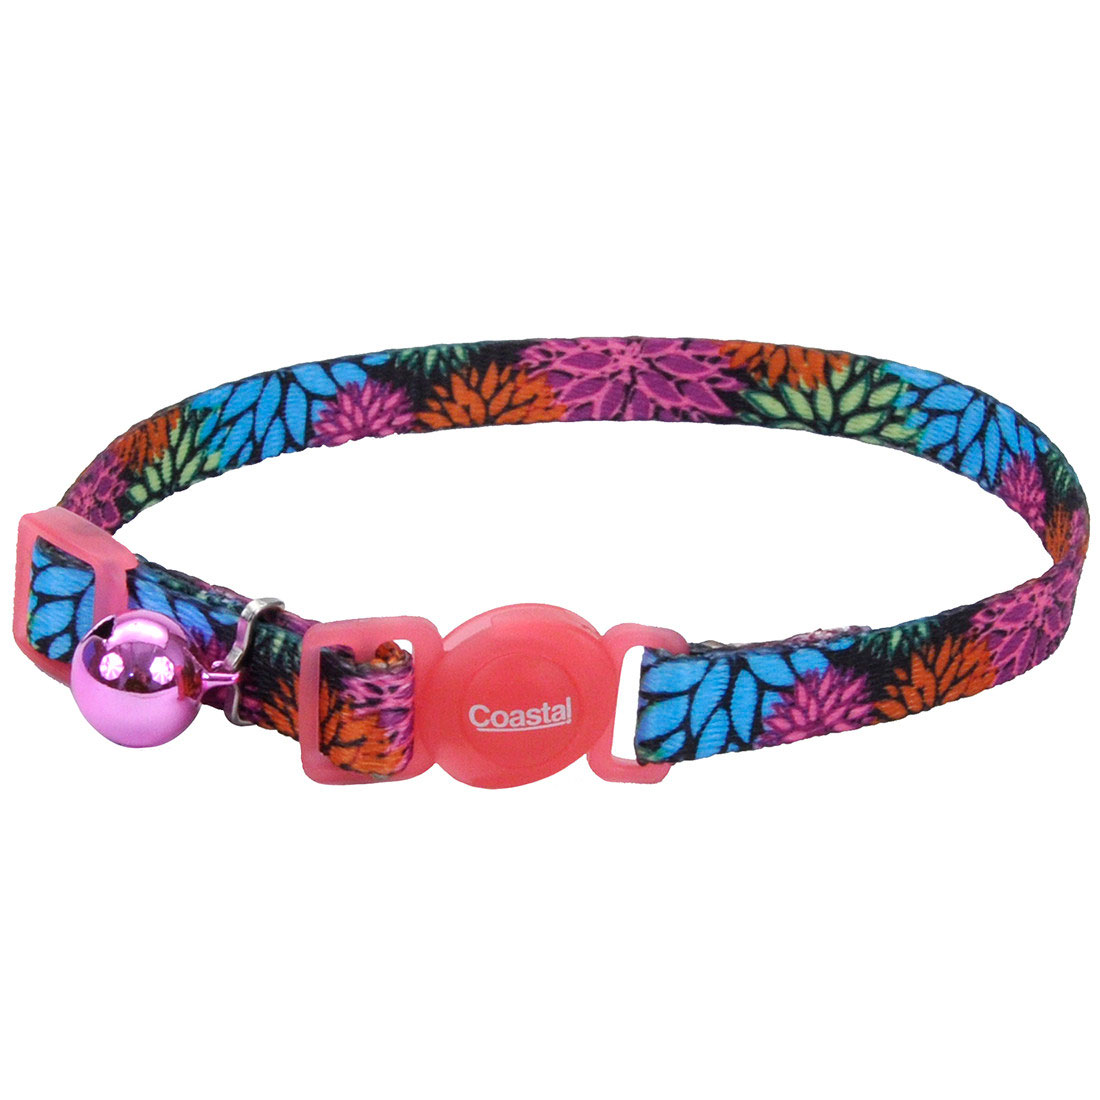 Coastal Pet Products 06701 WDF12